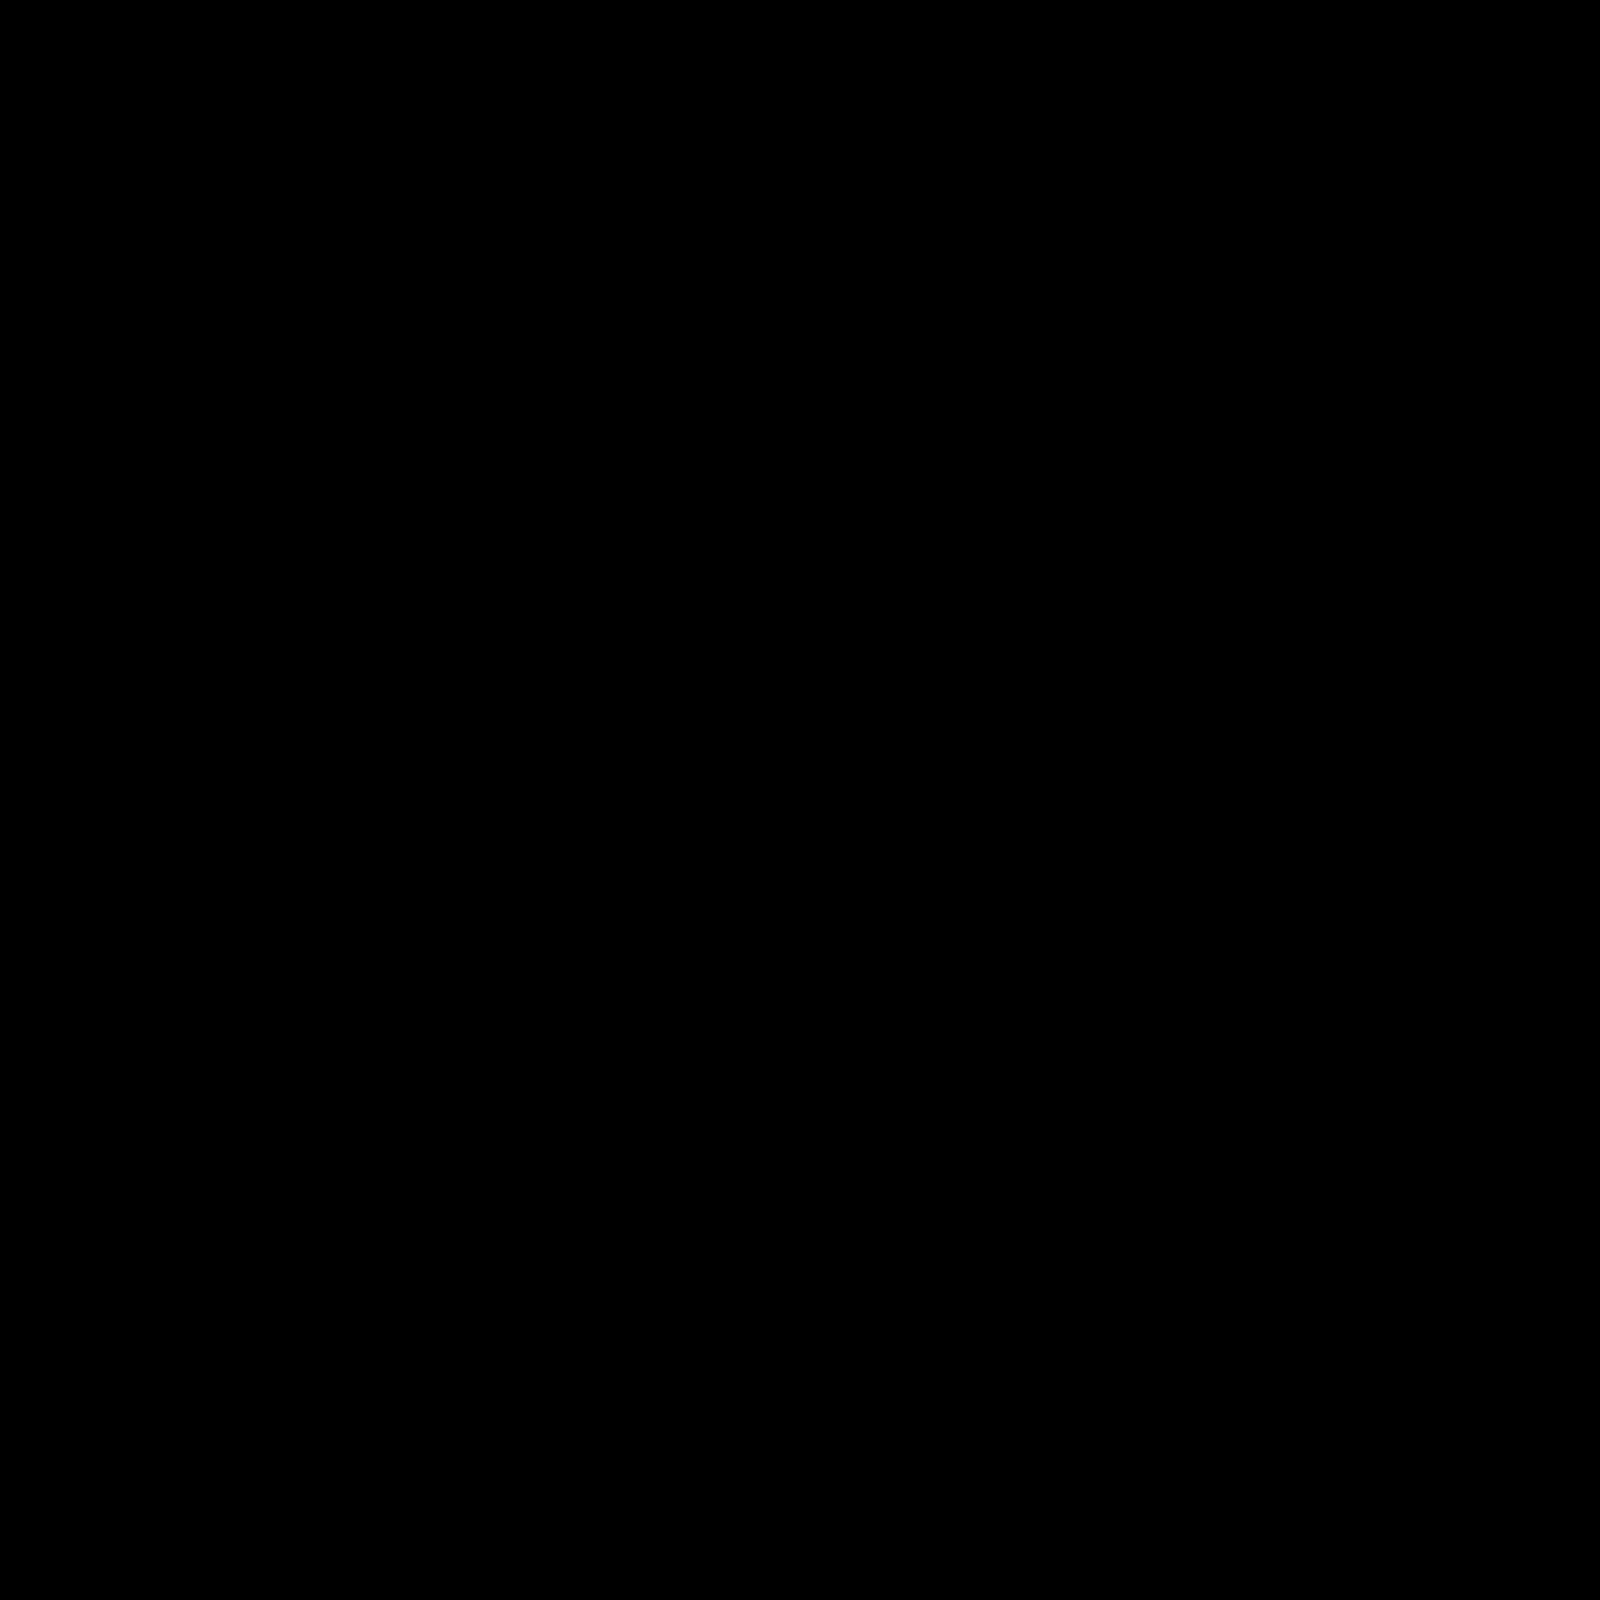 clip art freeuse Circled K Icon